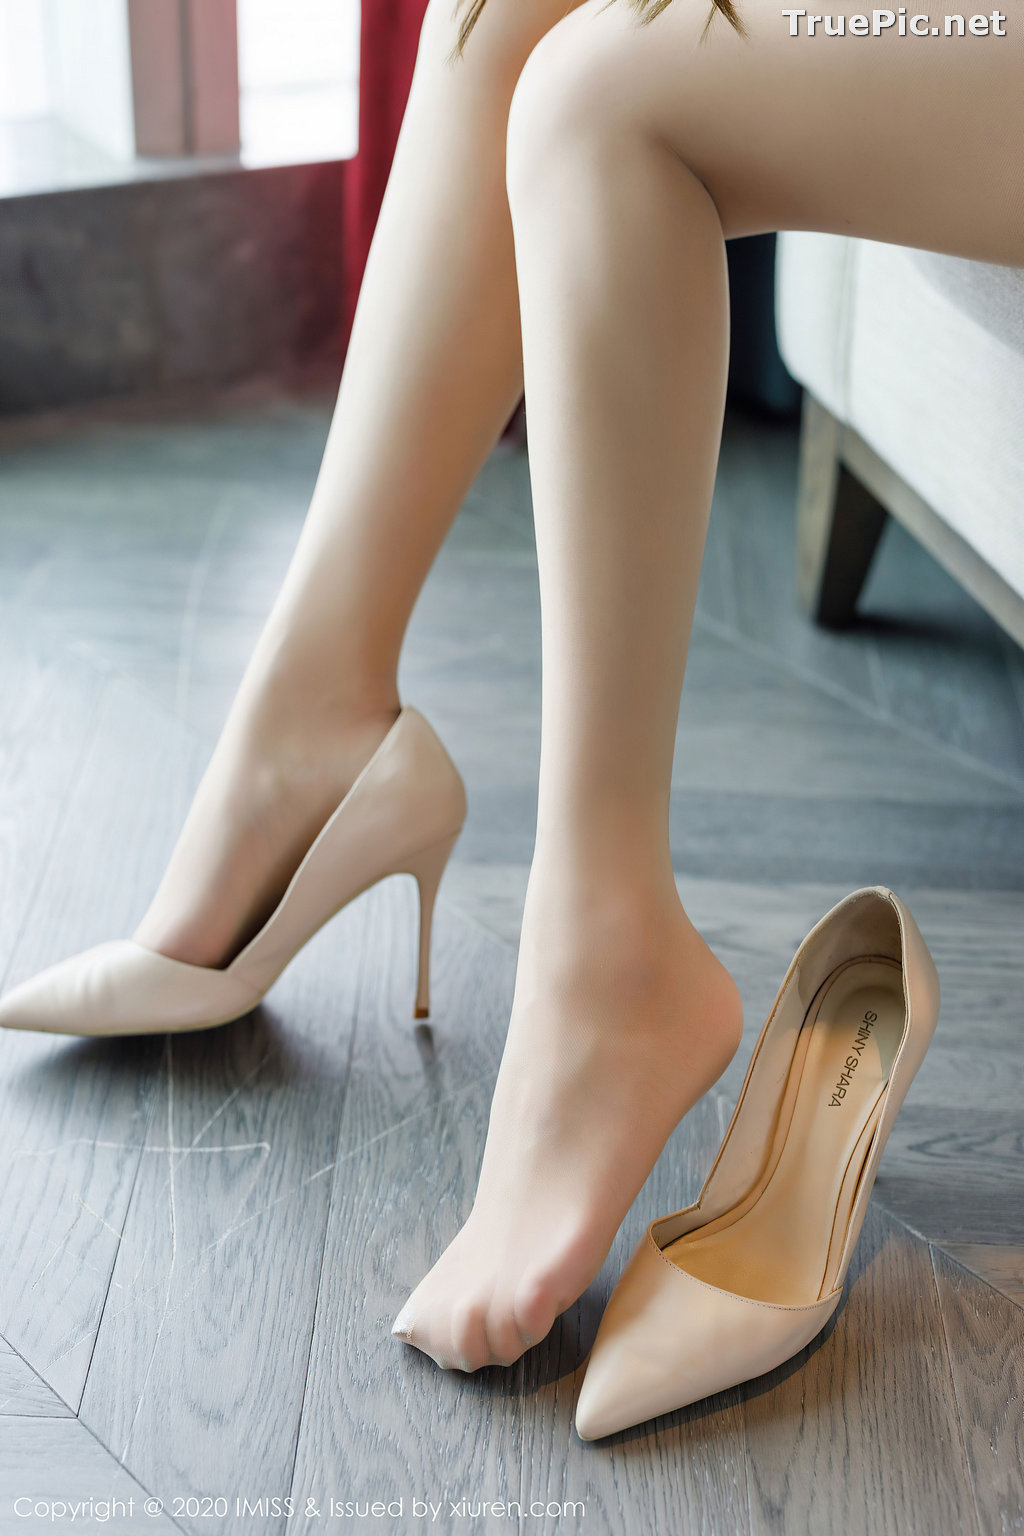 Image IMISS Vol.494 - Chinese Model - Lavinia肉肉 - Beautiful Long Legs Secretary - TruePic.net - Picture-3